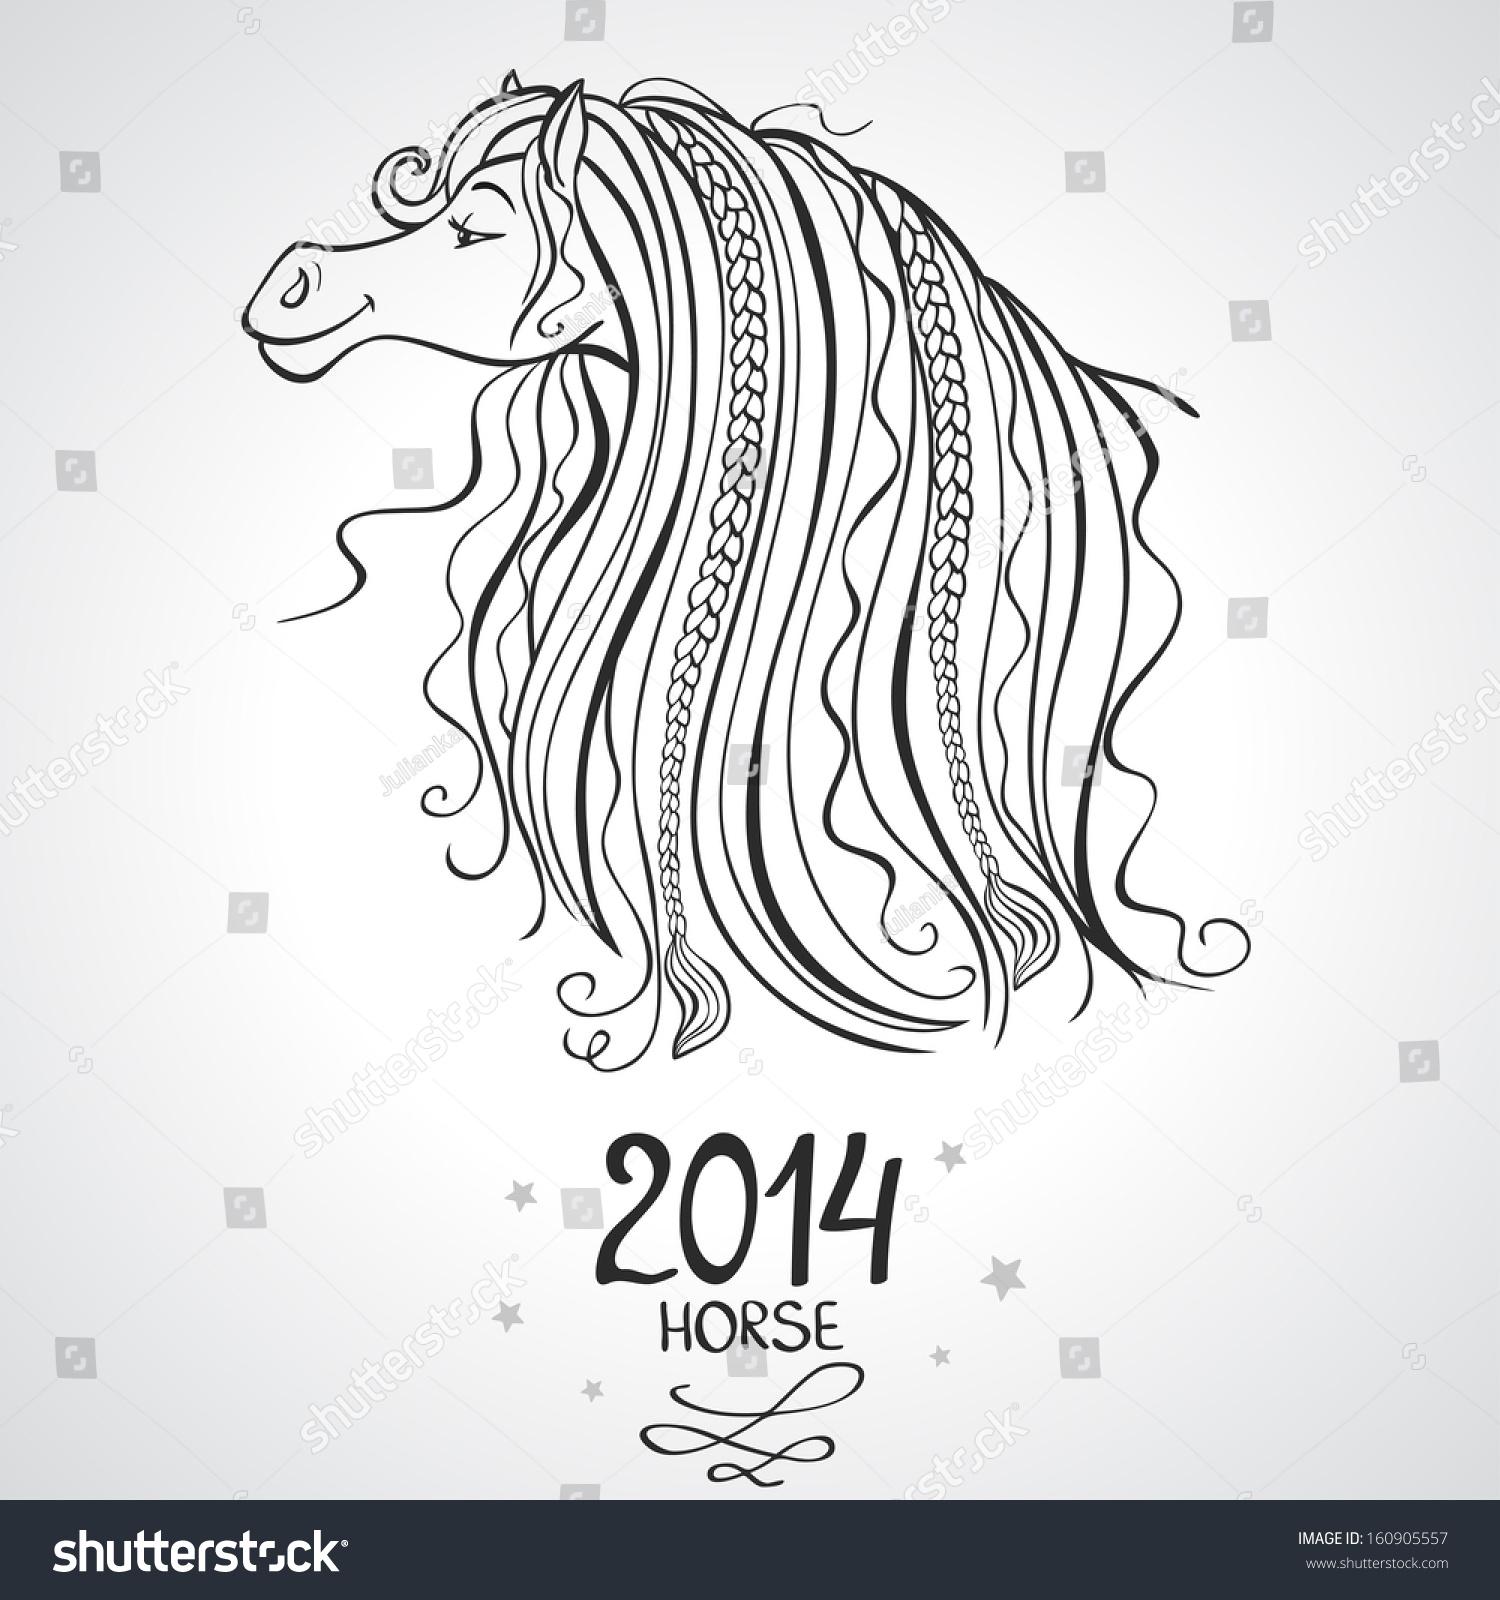 Black white silhouette horse symbol new stock vector 160905557 black and white silhouette horse symbol of the new year buycottarizona